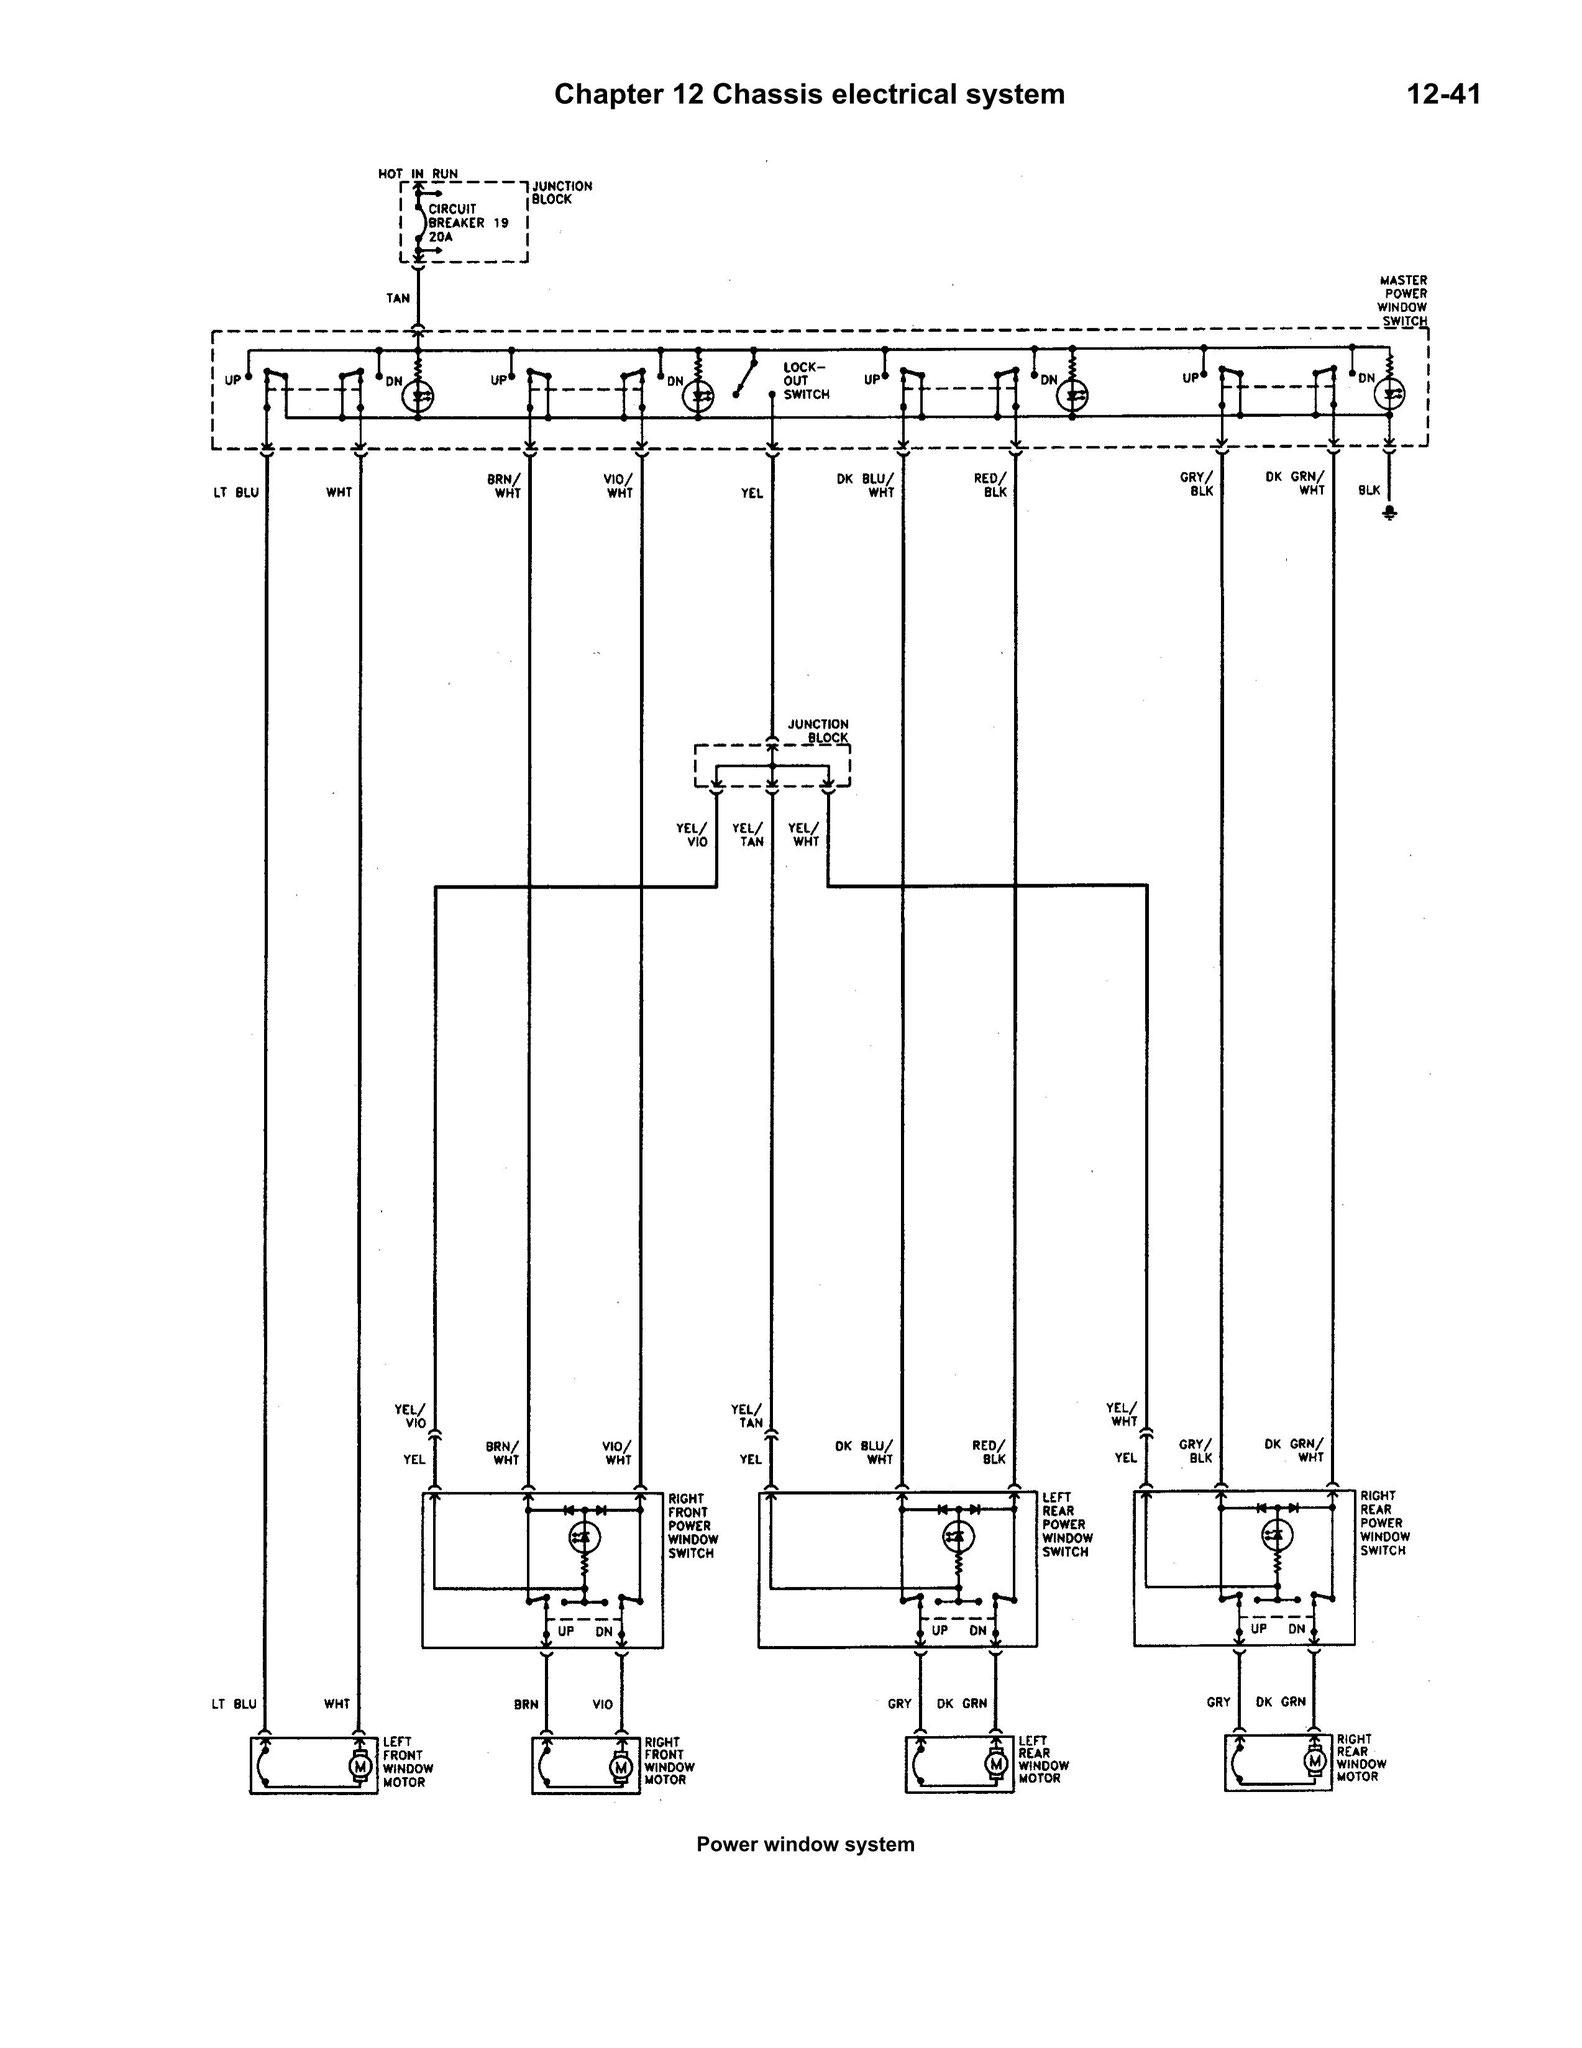 chrysler wiring diagrams schematics 2000 jeep wrangler starter diagram dodge stratus cirrus plymouth breeze 1995